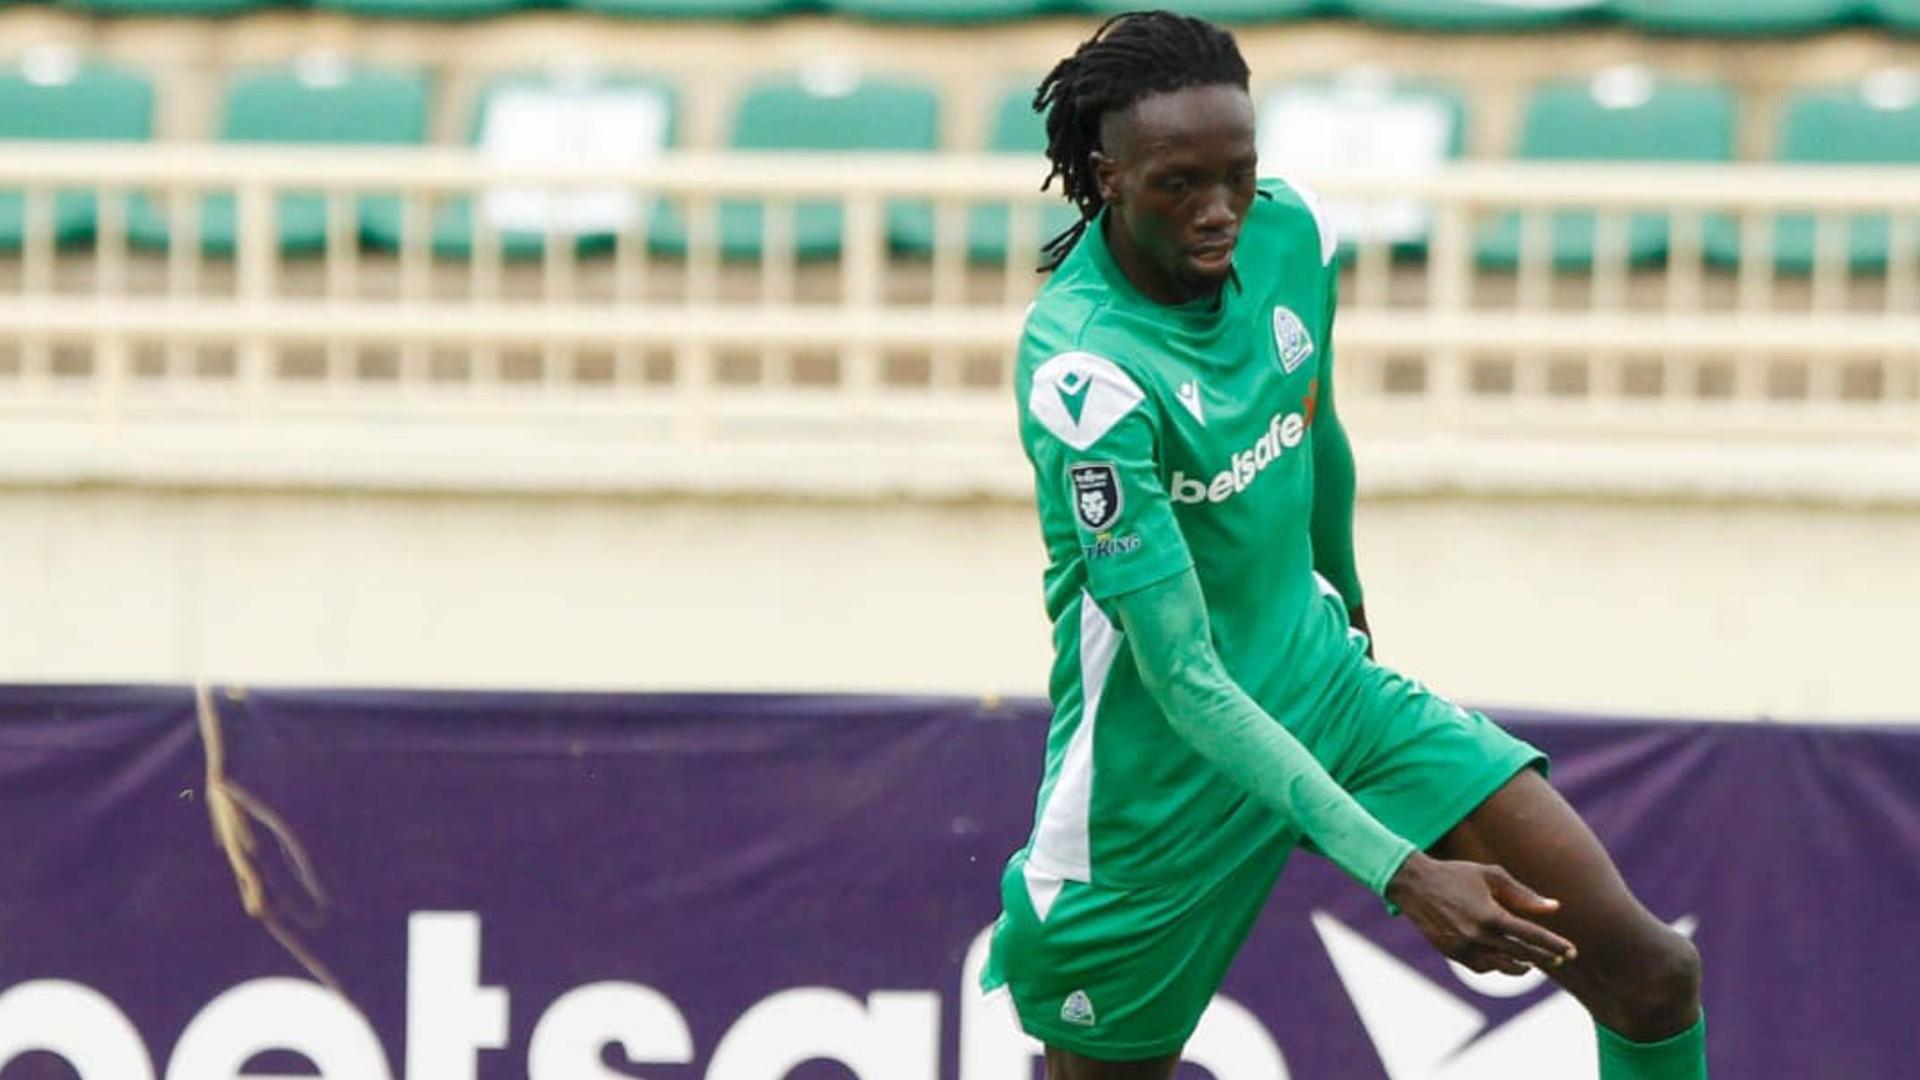 Gor Mahia to sign 'super strikers' as Ocholla confirms Okello, Ulimwengu departures